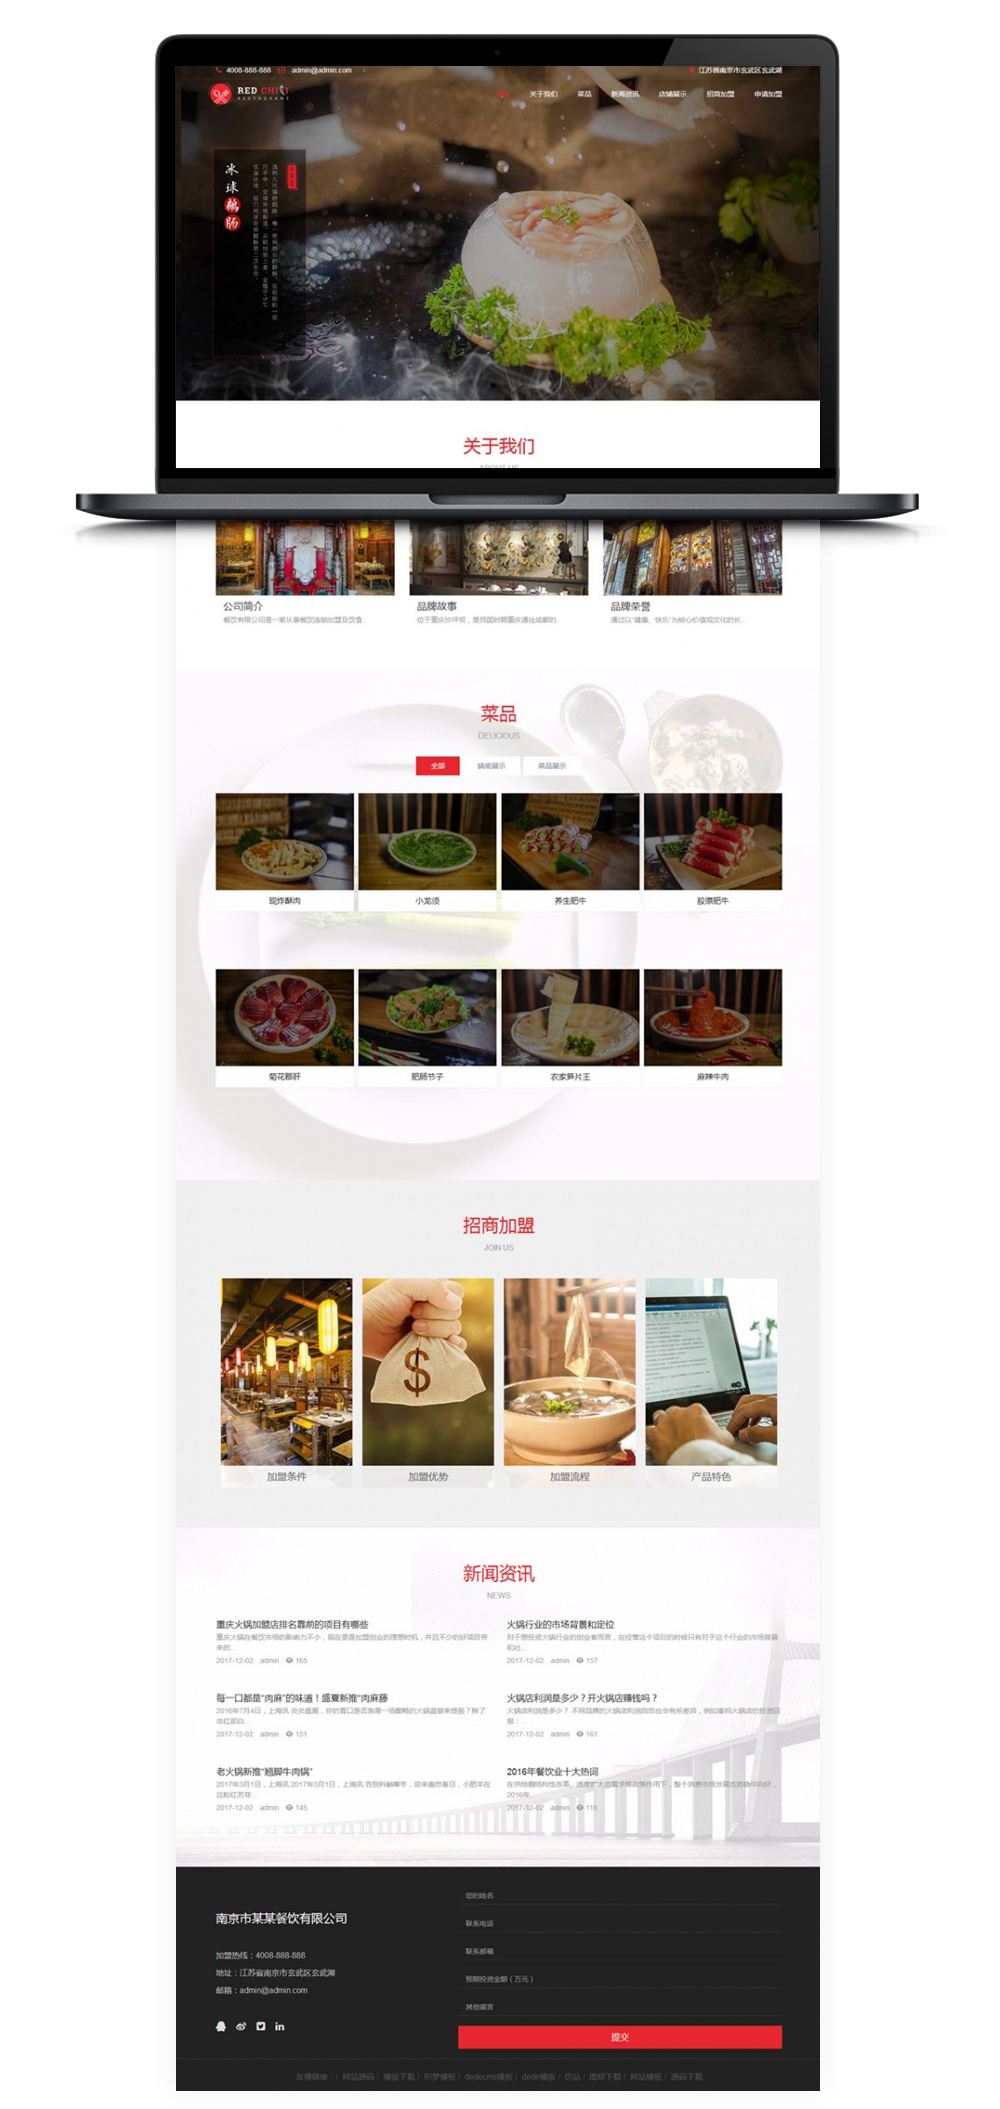 【DEDECMS模板】美食餐饮加盟管理企业网站HTML5模板[自适应手机WAP端]-蓝汇源码